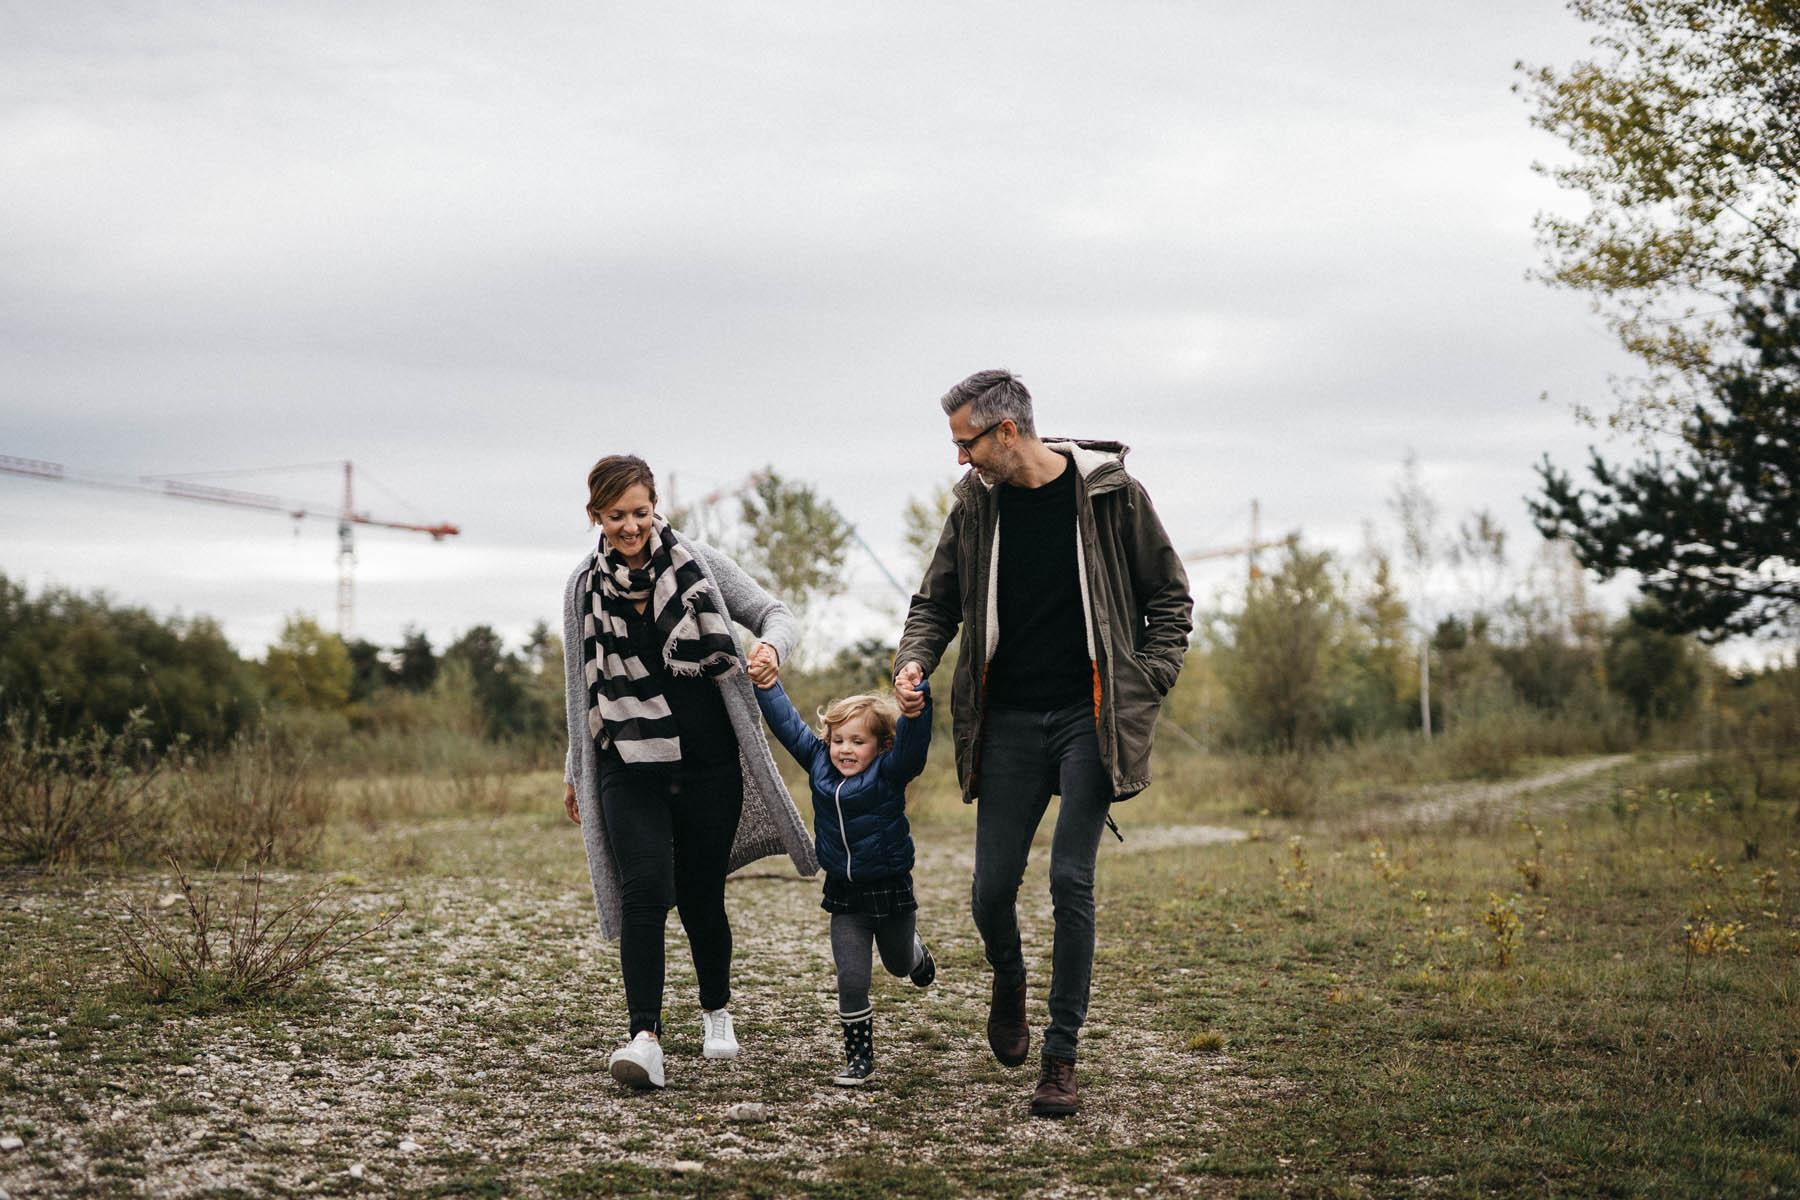 raissa simon fotografie familienfotos froettmaninger heide 031 - Annabel, Steffen + Cleo